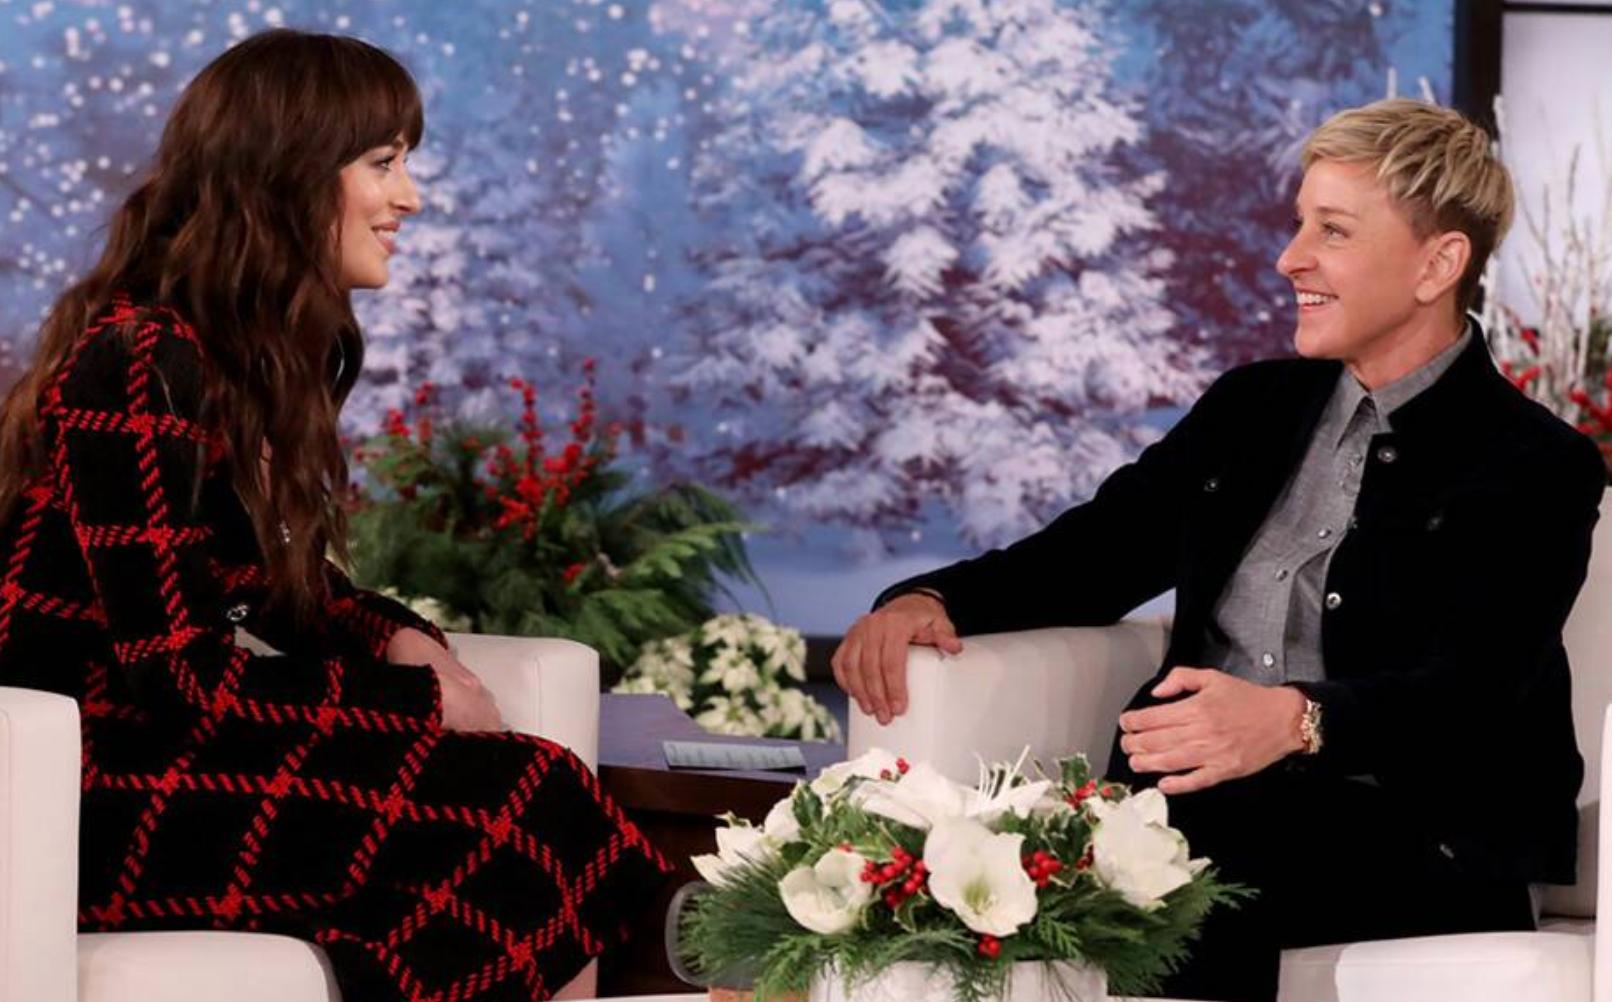 This Dakota Johnson Interview With Ellen DeGeneres Is So Delightfully Awkward